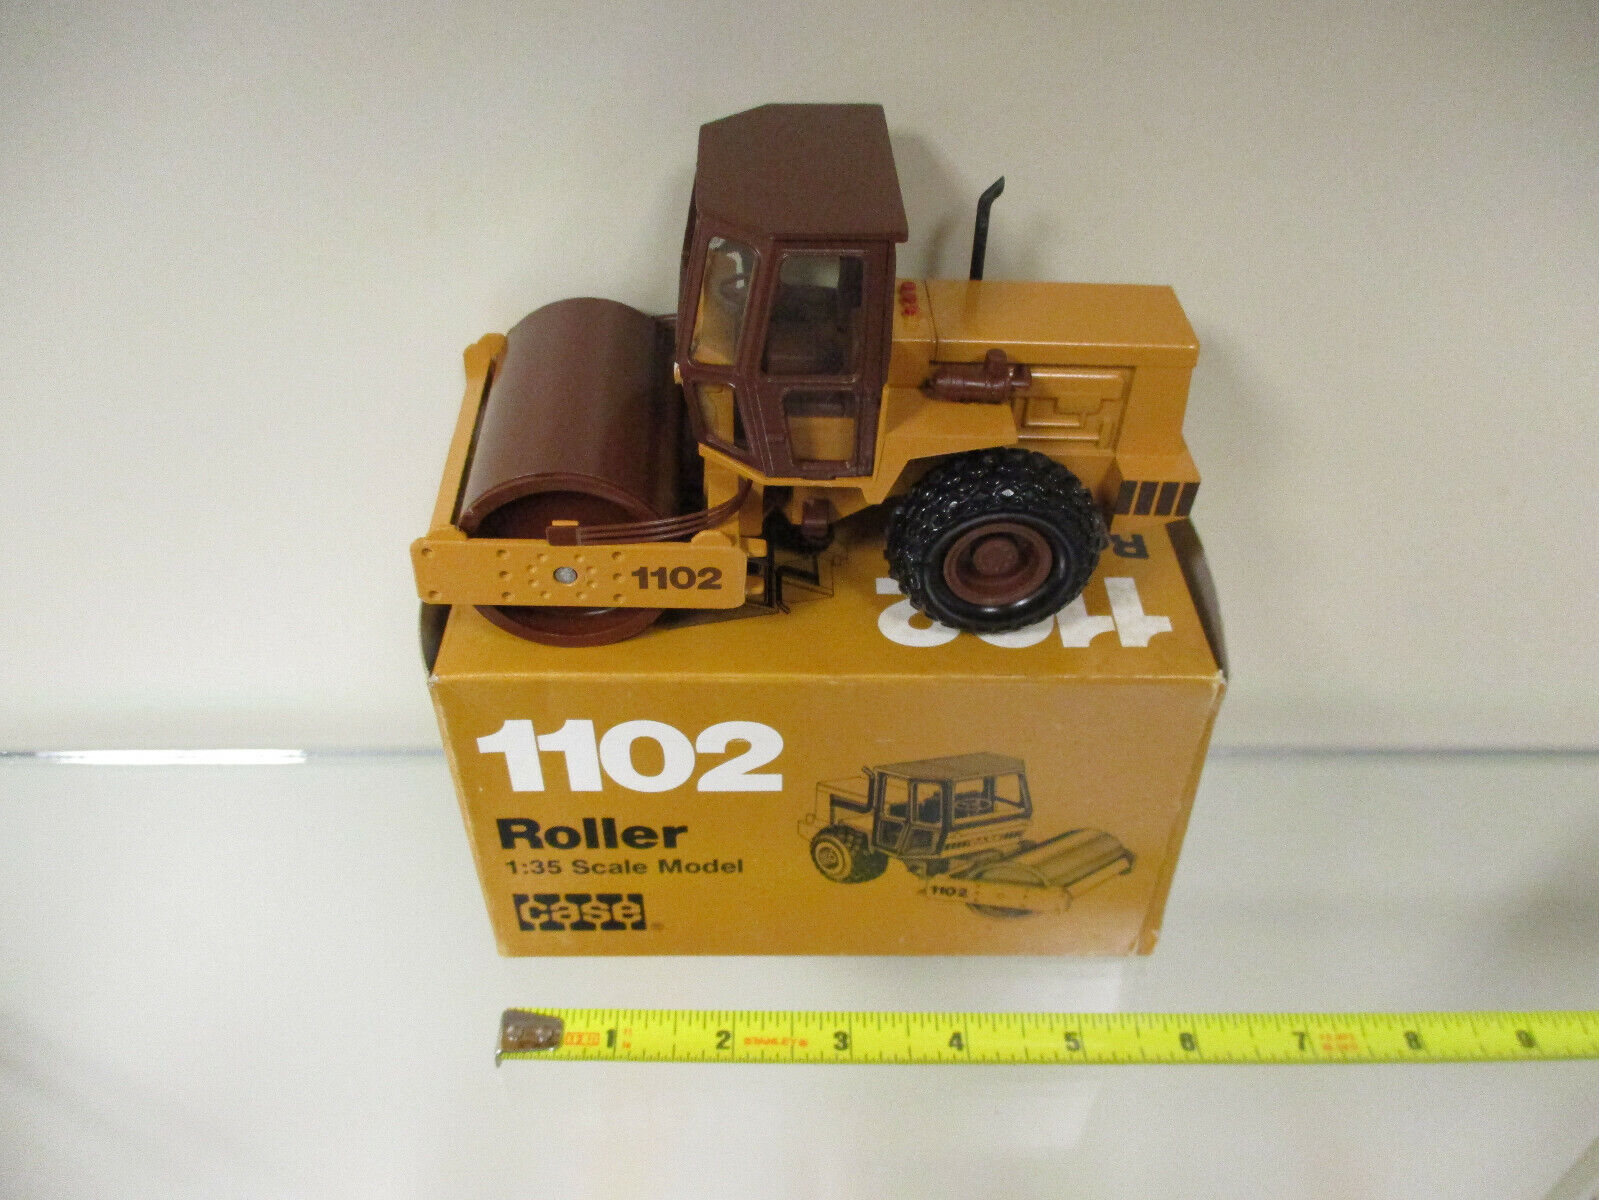 Case 1102 Roller by Conrad 1 35th Scale